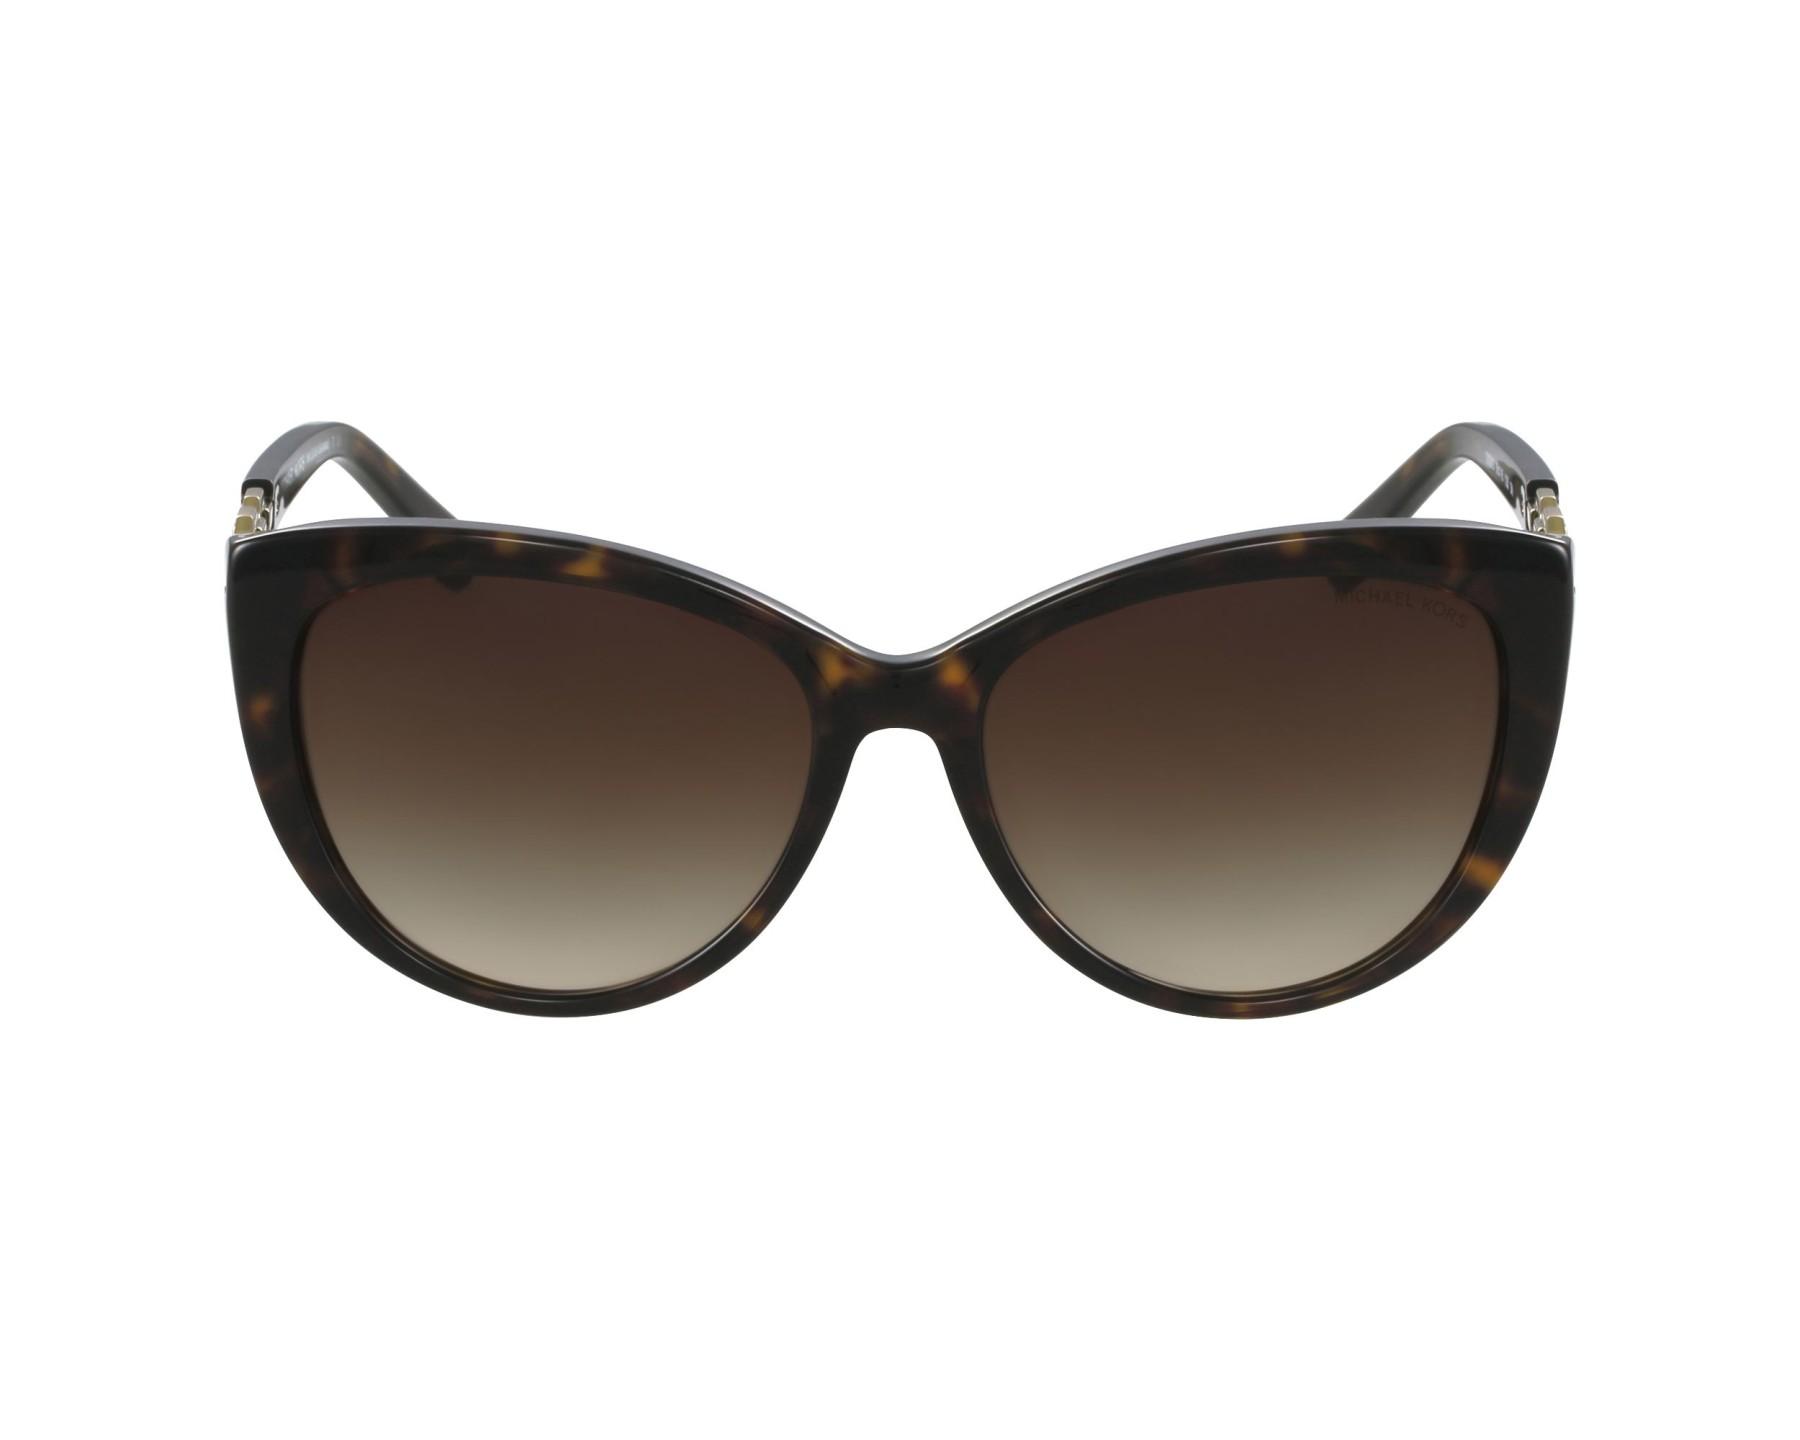 lunettes de soleil michael kors mk 2009 300613 havane pas cher visionet. Black Bedroom Furniture Sets. Home Design Ideas